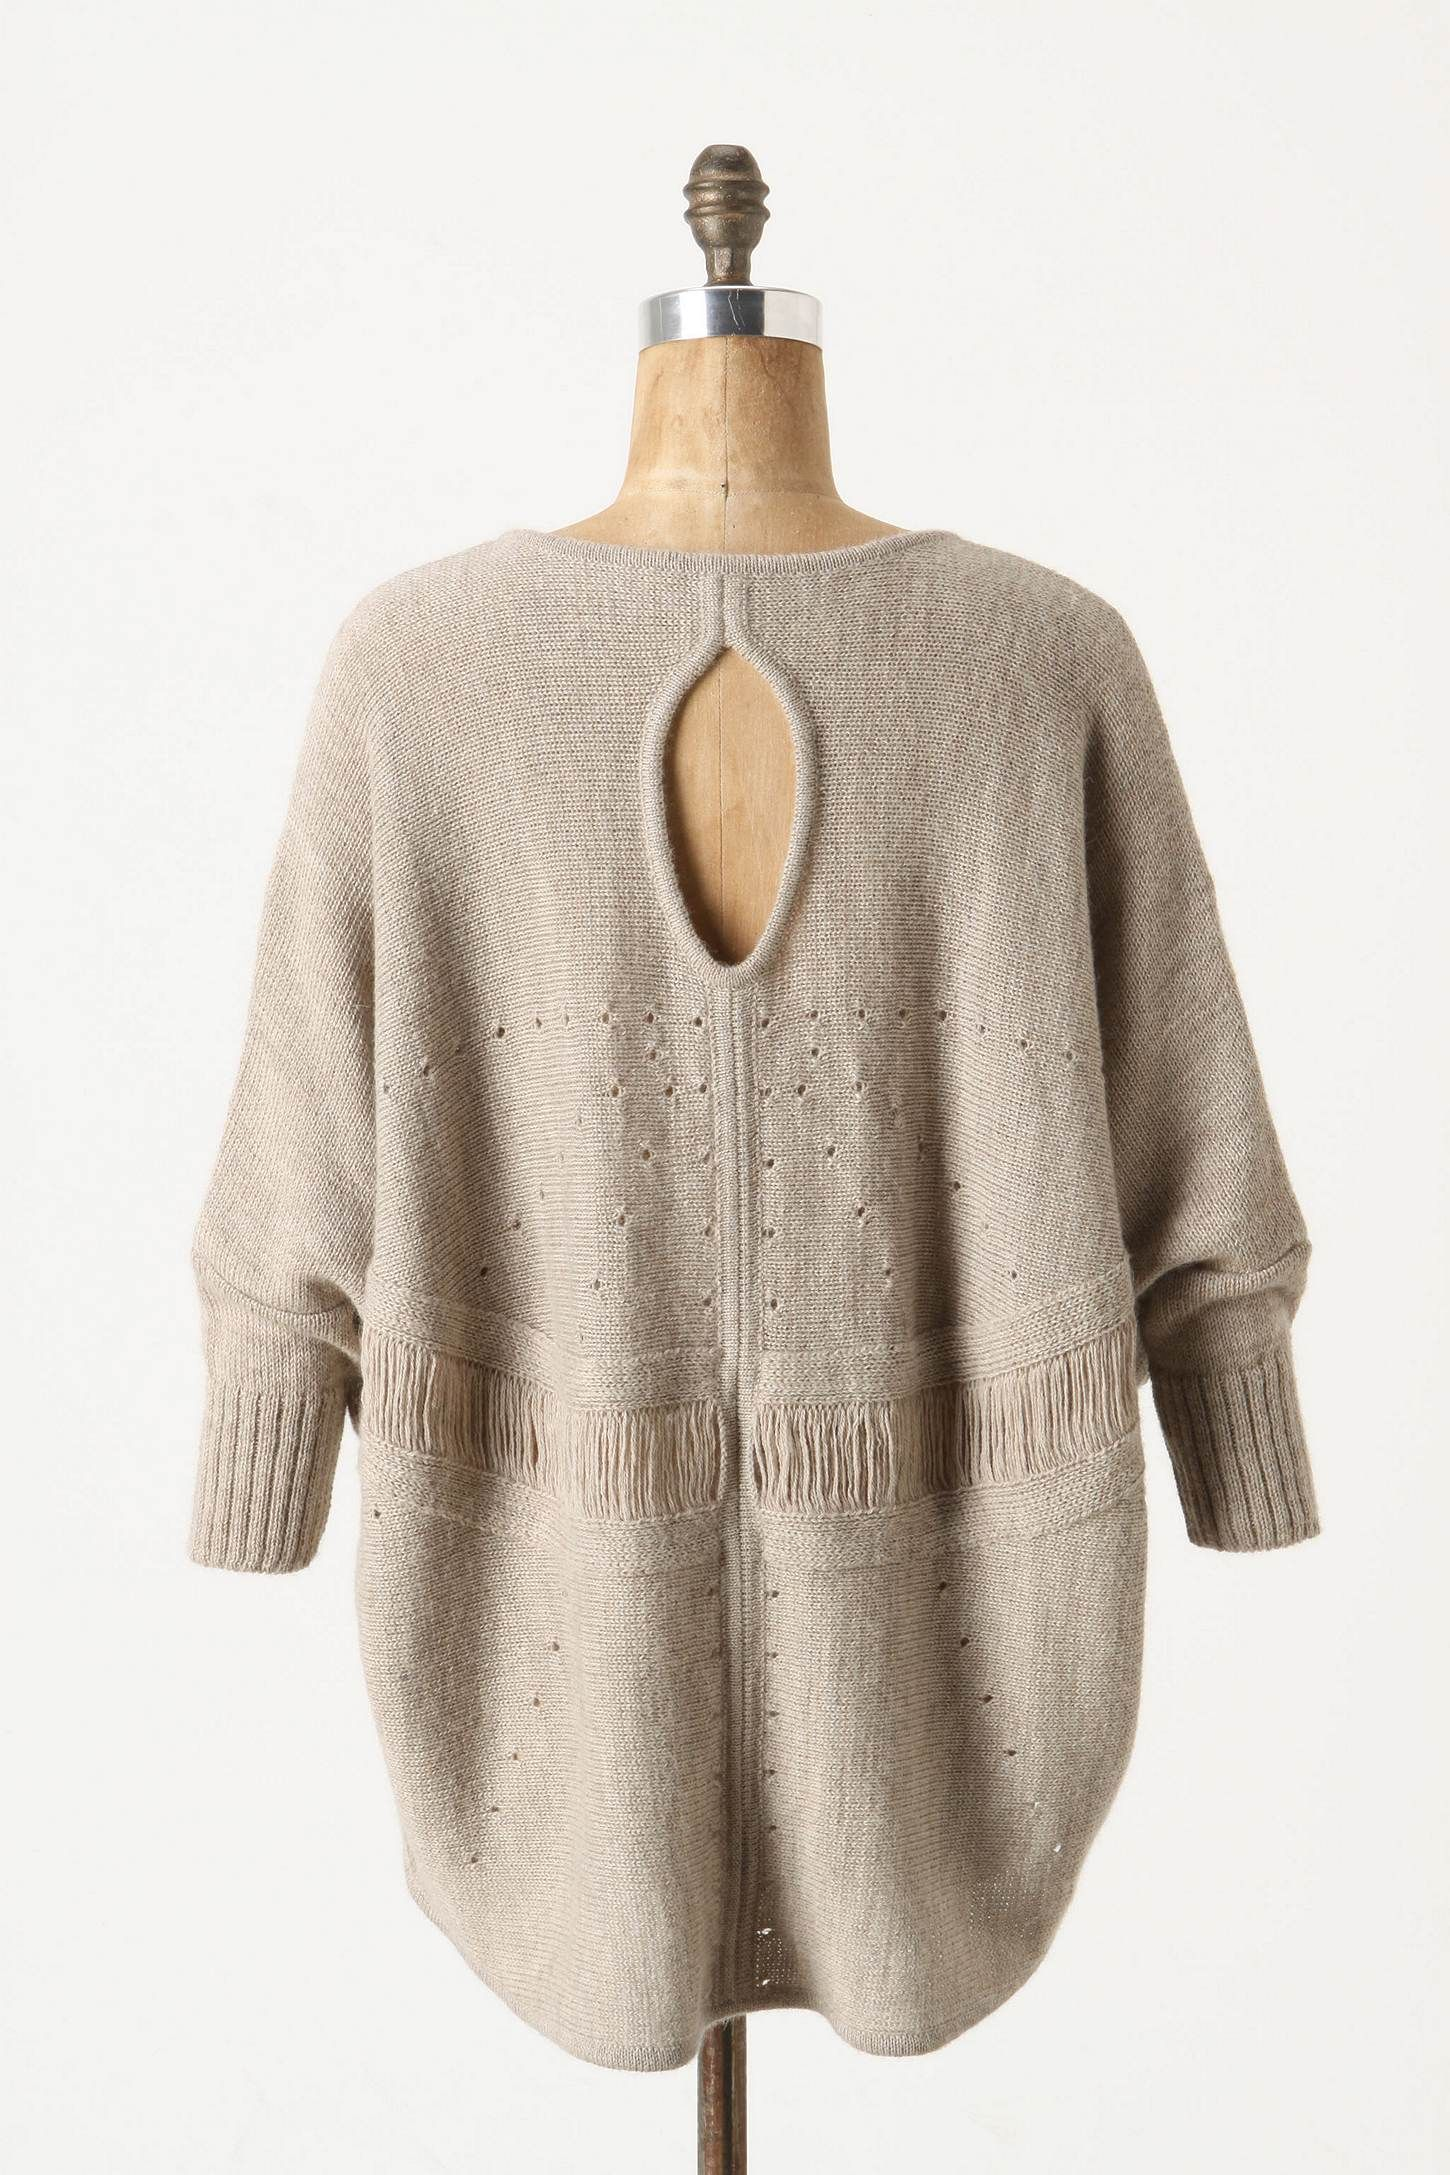 Geneva Down Alternative Sham Insert | Slouchy sweater, Drop and ...